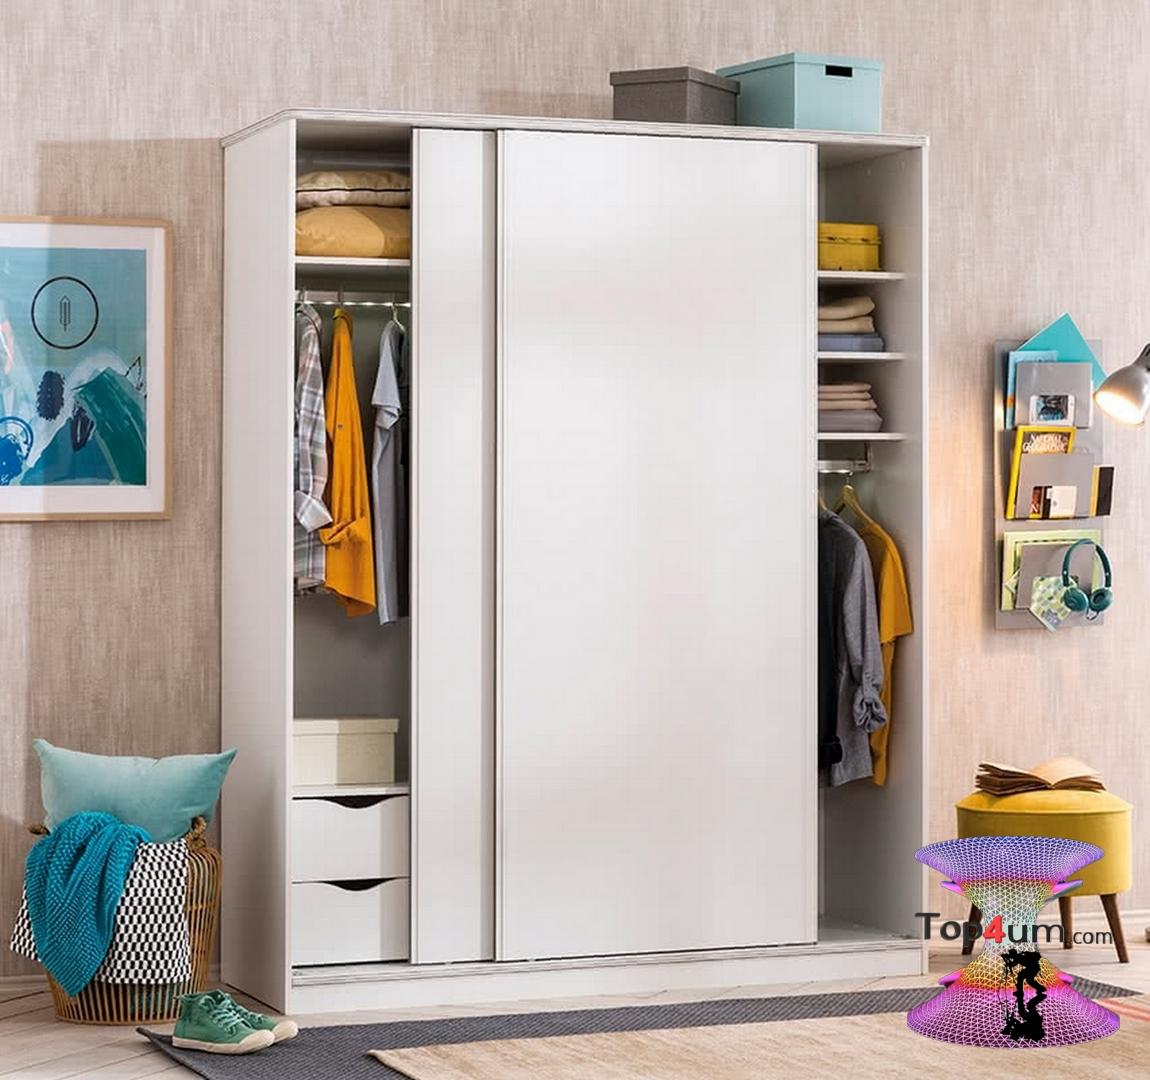 f:id:kitchendesignsegypt:20191020021915j:plain